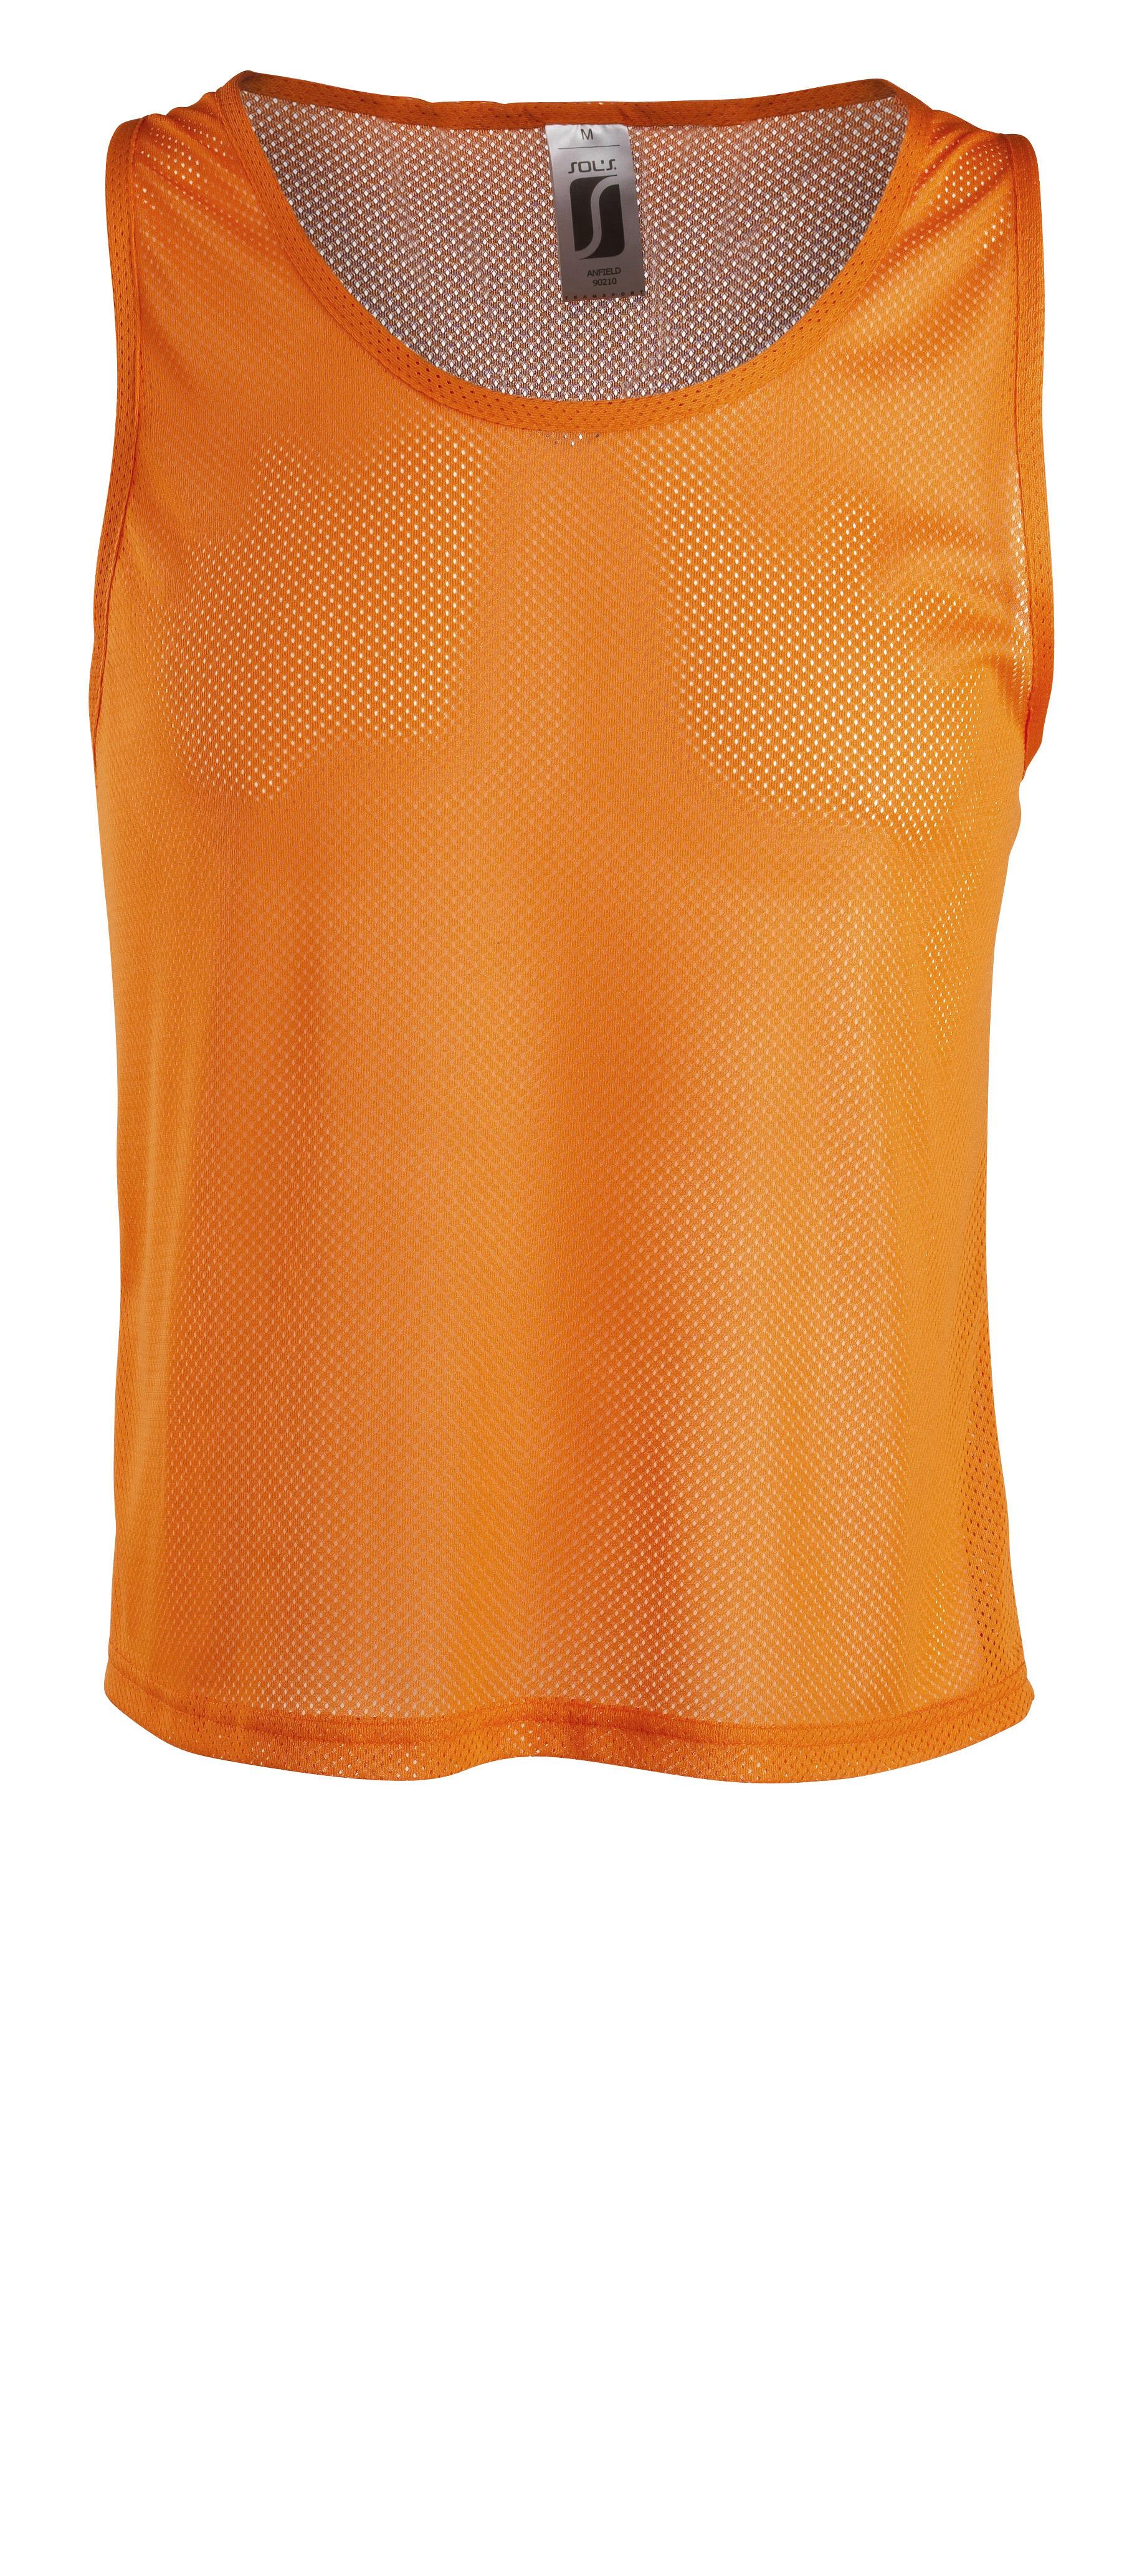 Anfield - Orange - M